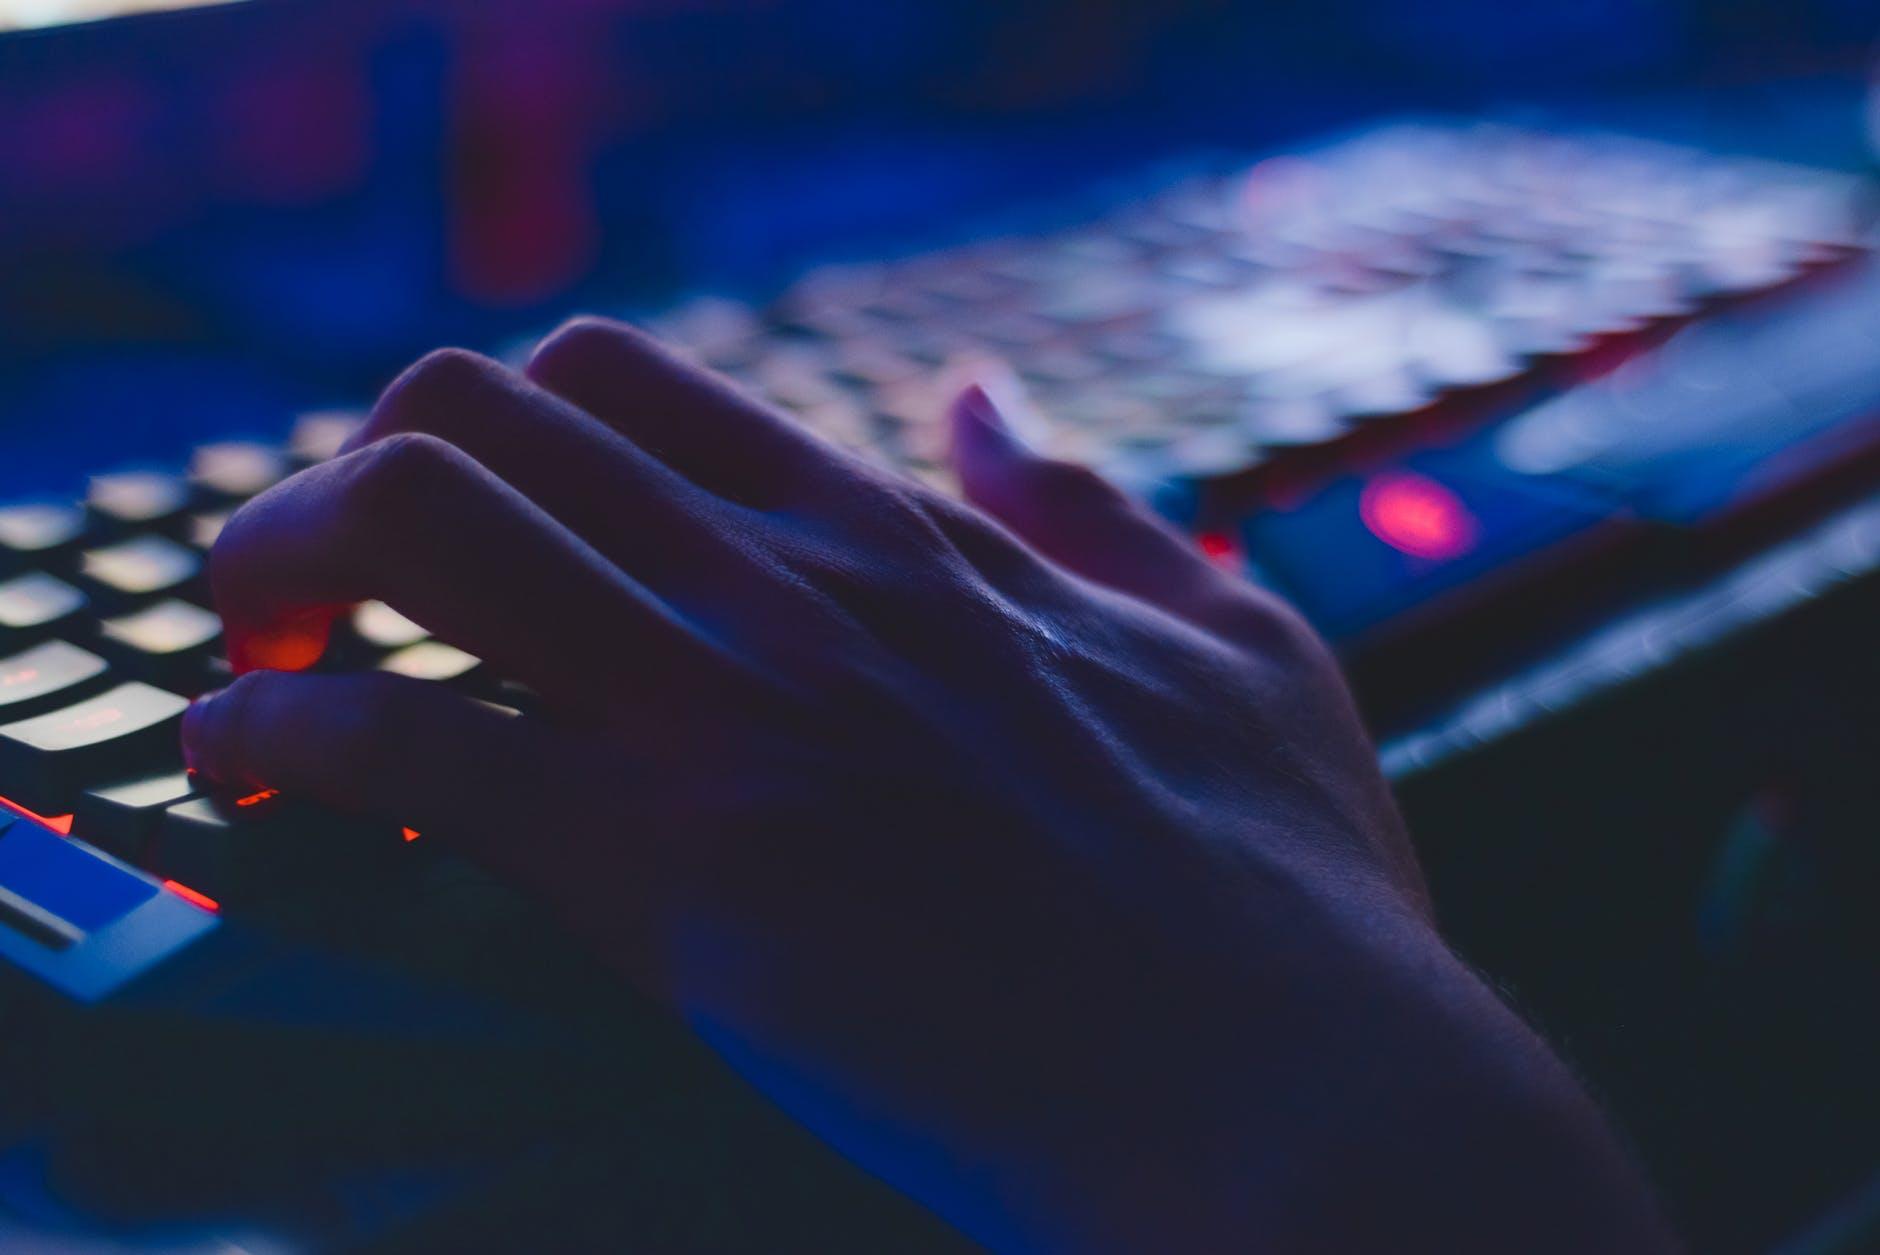 Corsair Gaming (CRSR) dwindles as competitors rise